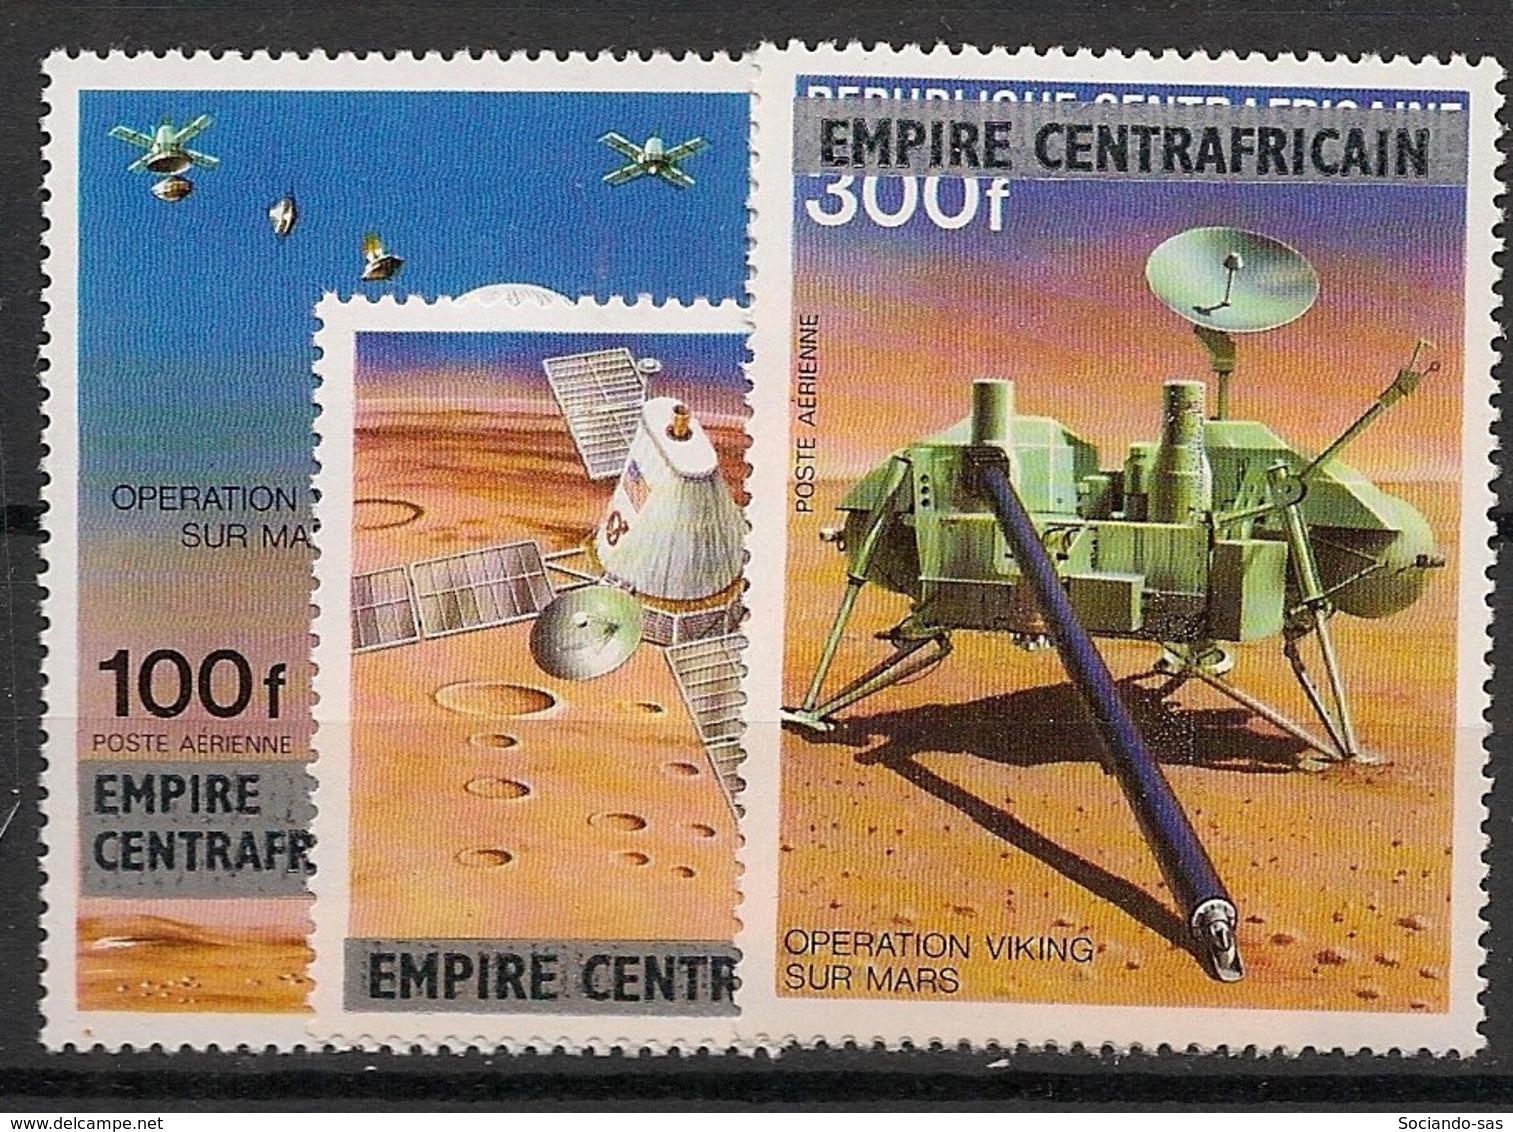 Centrafricaine - 1977 - Poste Aérienne PA N°Yv. 178 à 180 - Opération Viking - Neuf Luxe ** / MNH / Postfrisch - Zentralafrik. Republik